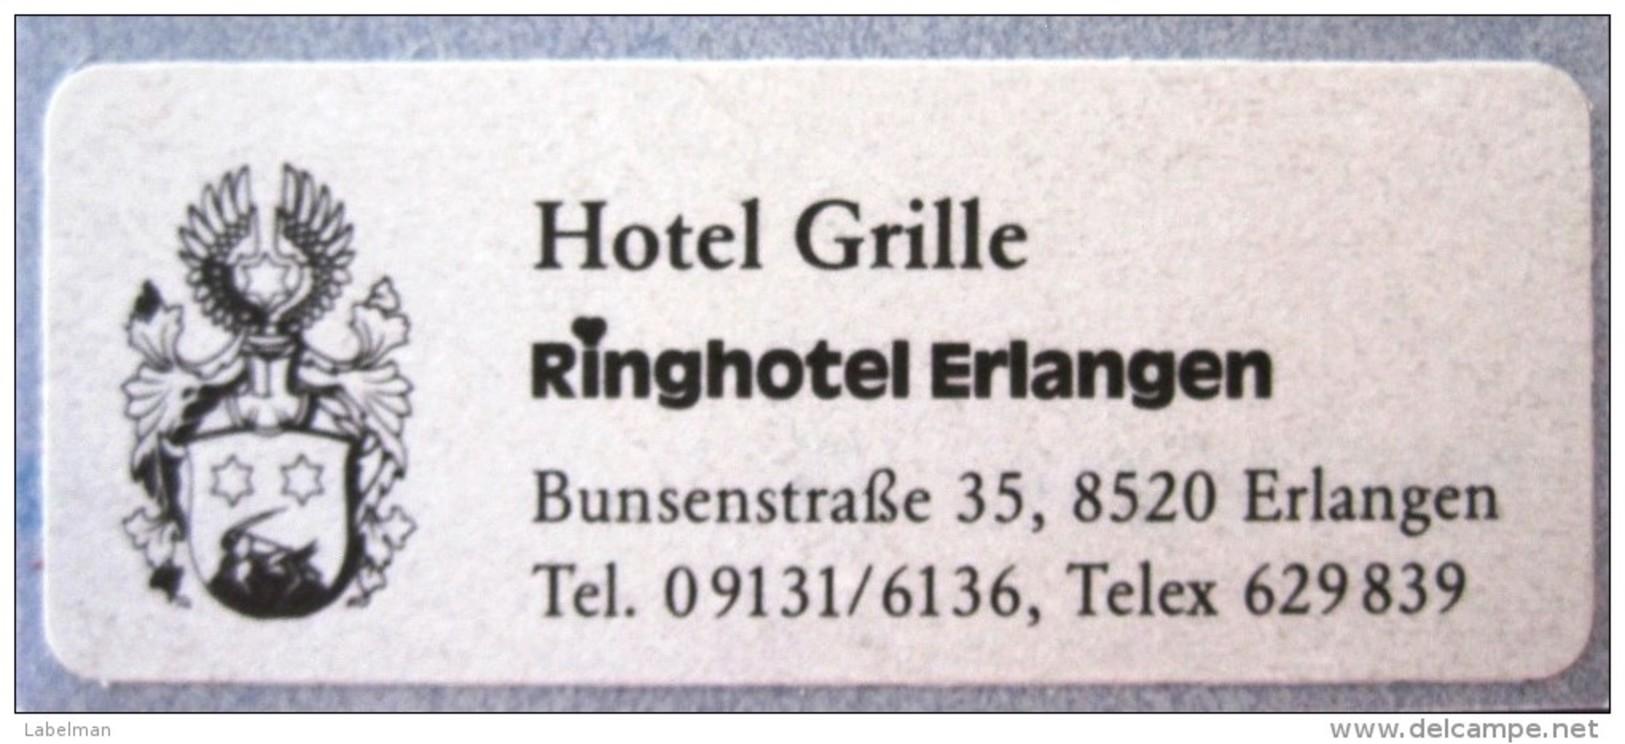 HOTEL GRILLE NO NAME RING ERLANGEN GERMANY DEUTSCHLAND ALLEMAGNE MINI STICKER LUGGAGE LABEL ETIQUETTE AUFKLEBER BERLIN - Hotel Labels